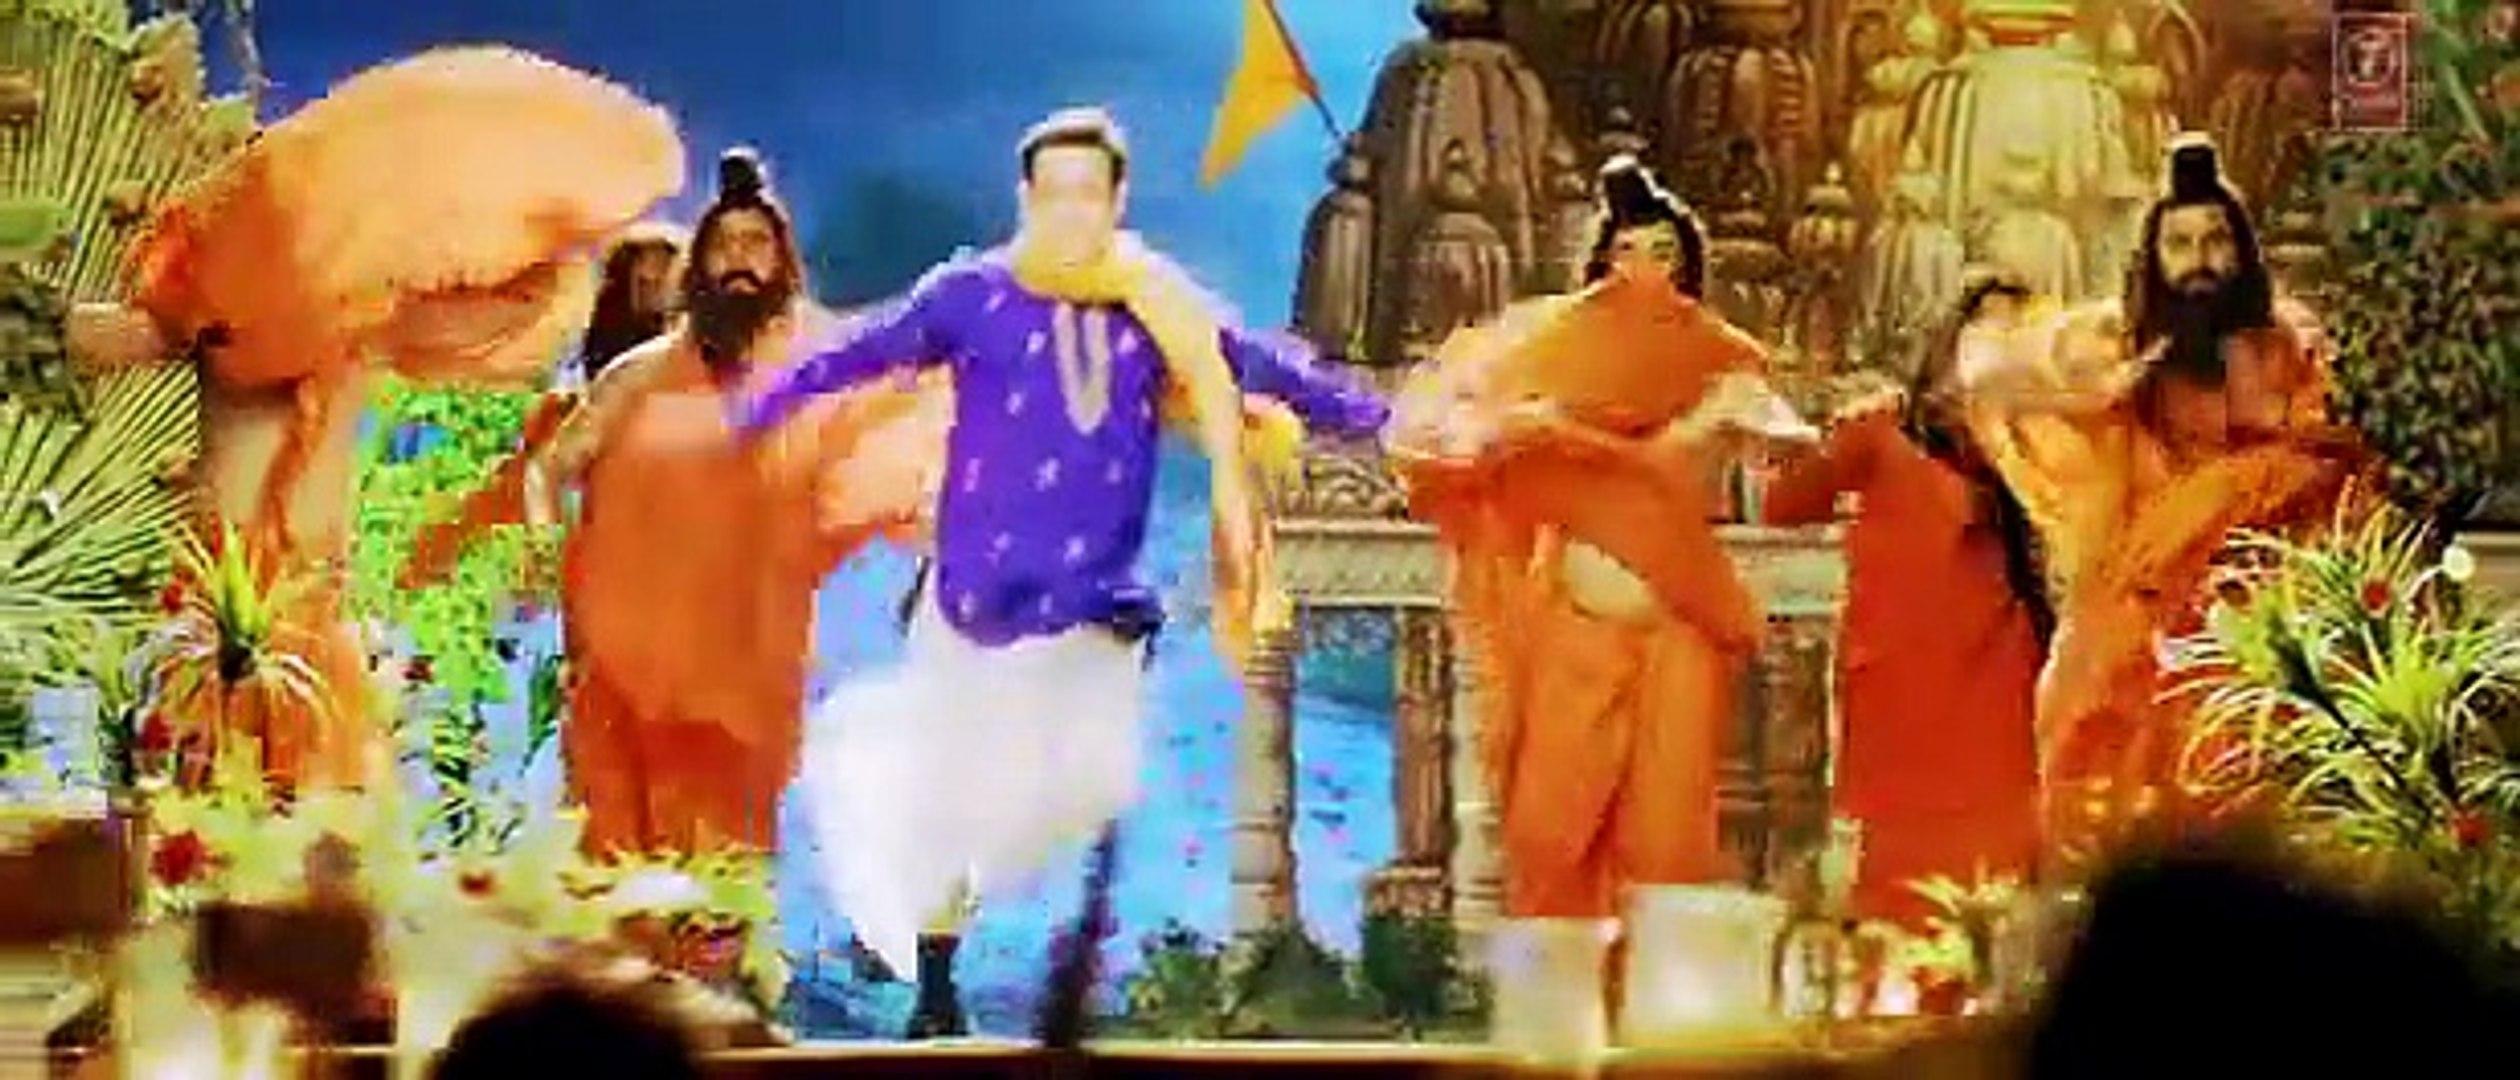 New Hindi Video Songs -  Salman Khan Prem Leela Video Song Prem Ratan Dhan Payo Sonam Kapoor T-serie